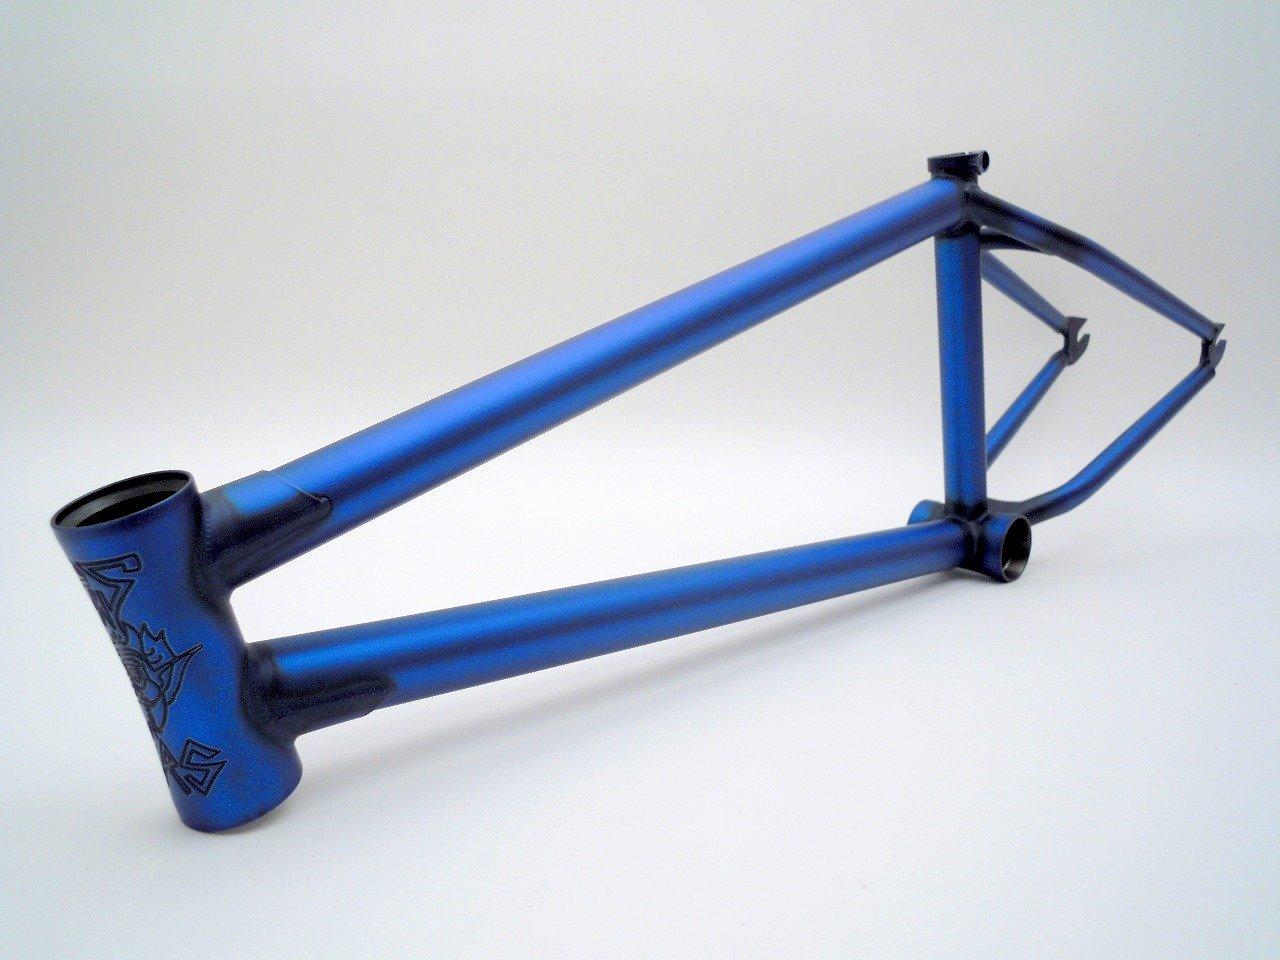 (BMX ストリート フレーム) STRESS BMX BES Frame マットトランスブルー TT20.25 B07DD8Y24R